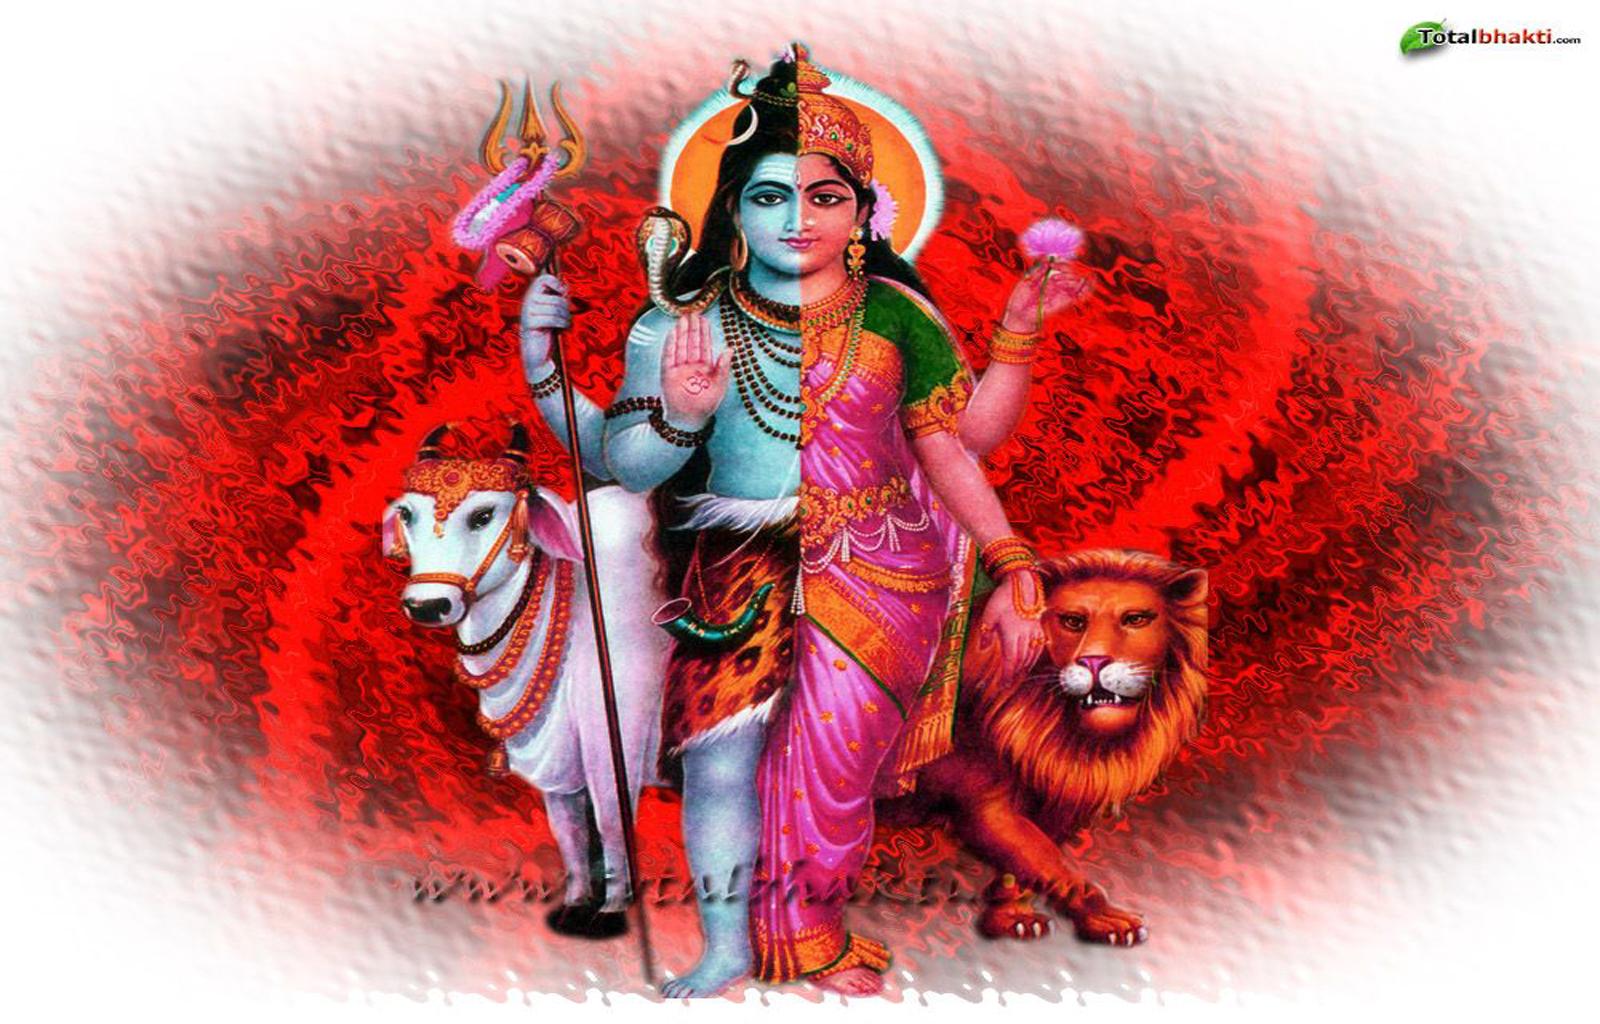 http://4.bp.blogspot.com/-Wt5HluVCl8c/T9cOkO4ezAI/AAAAAAAAAMA/UoQoJppLFCs/s1600/Lord+shiva+wallpaper.jpg